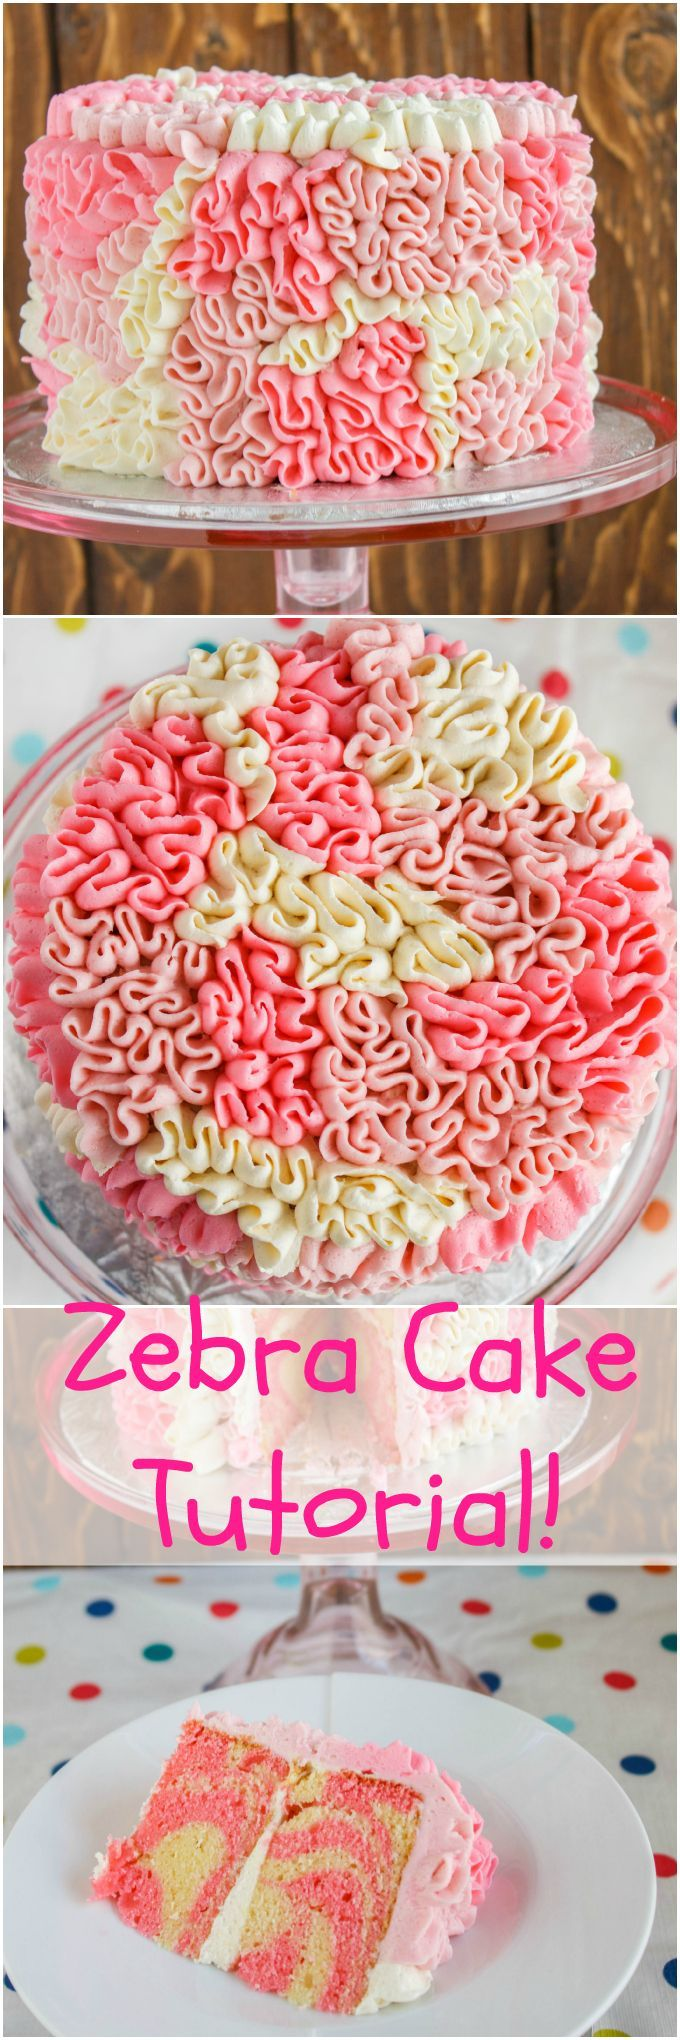 Zebra Cake with Messy Ruffles | #cake #dessert #pink | thecookiewriter.com